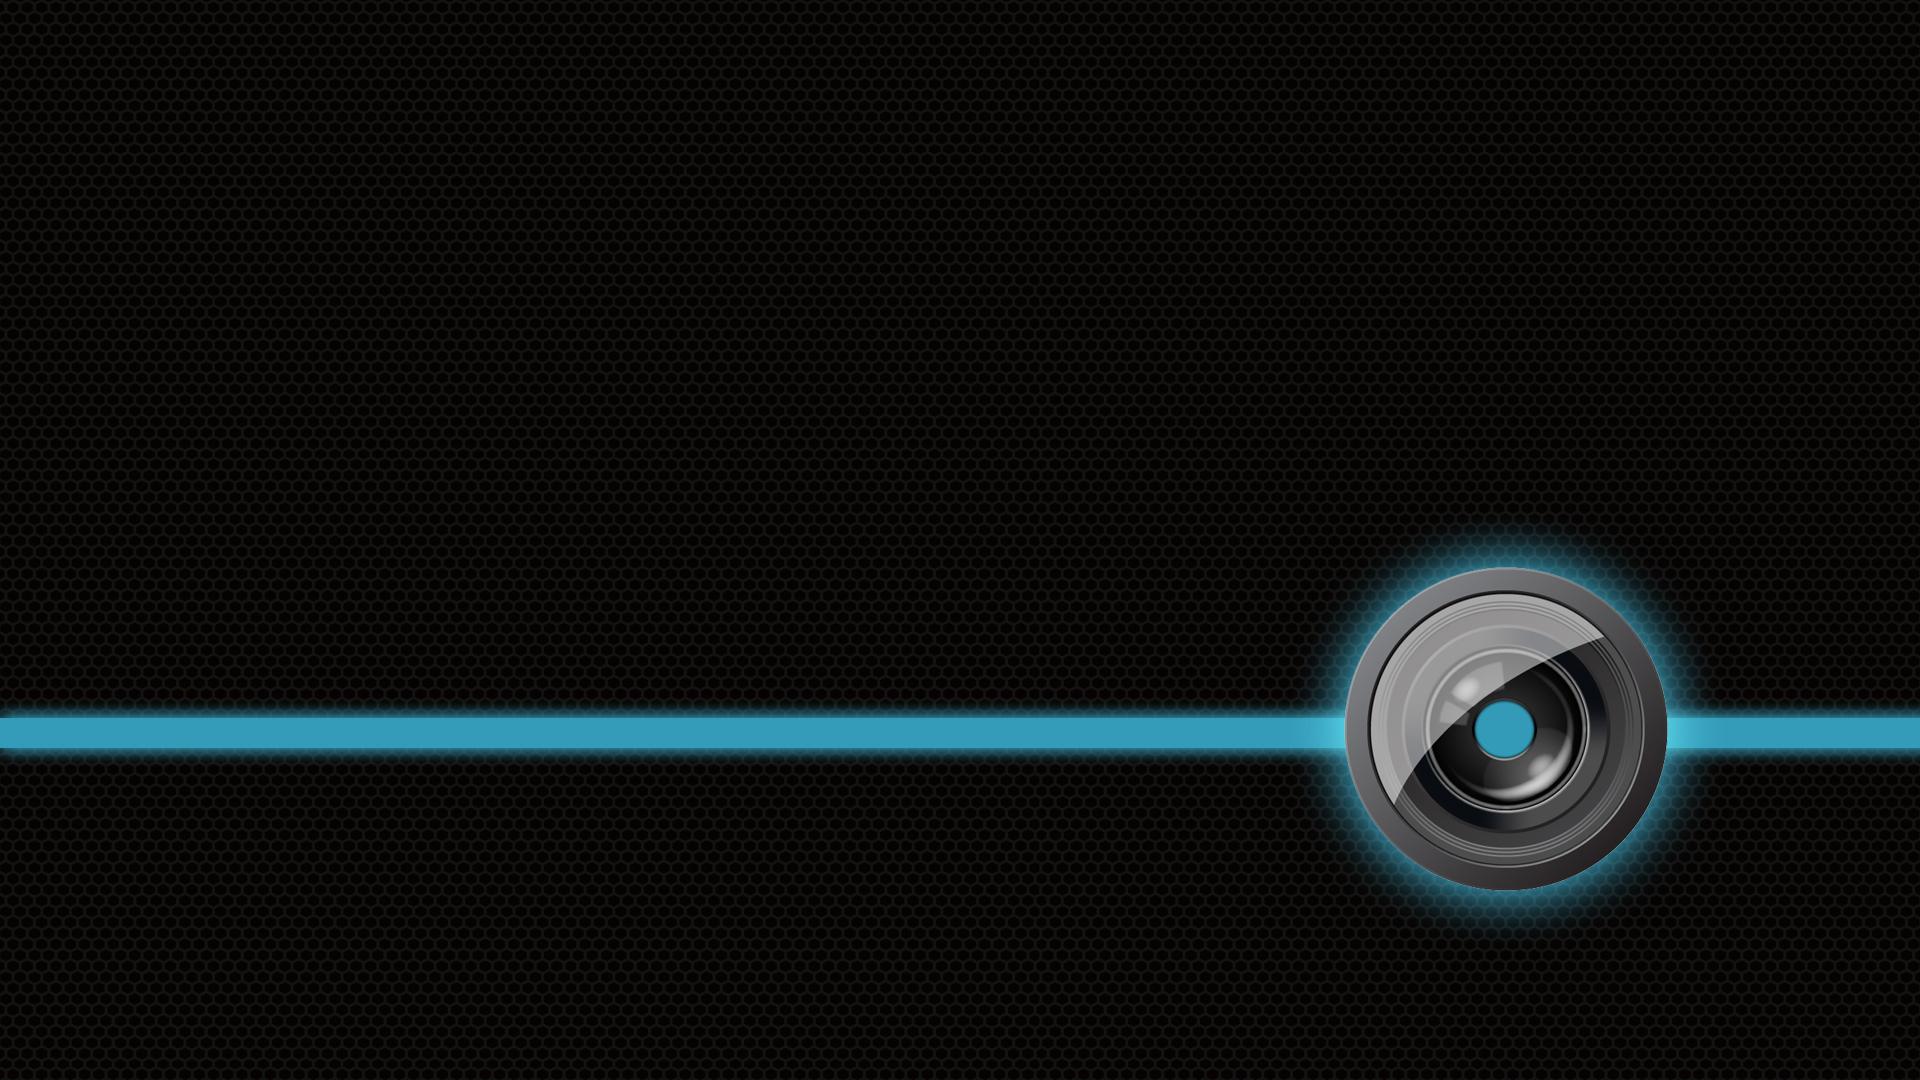 Download free windows 8 light animated wallpaper, windows 8 light.